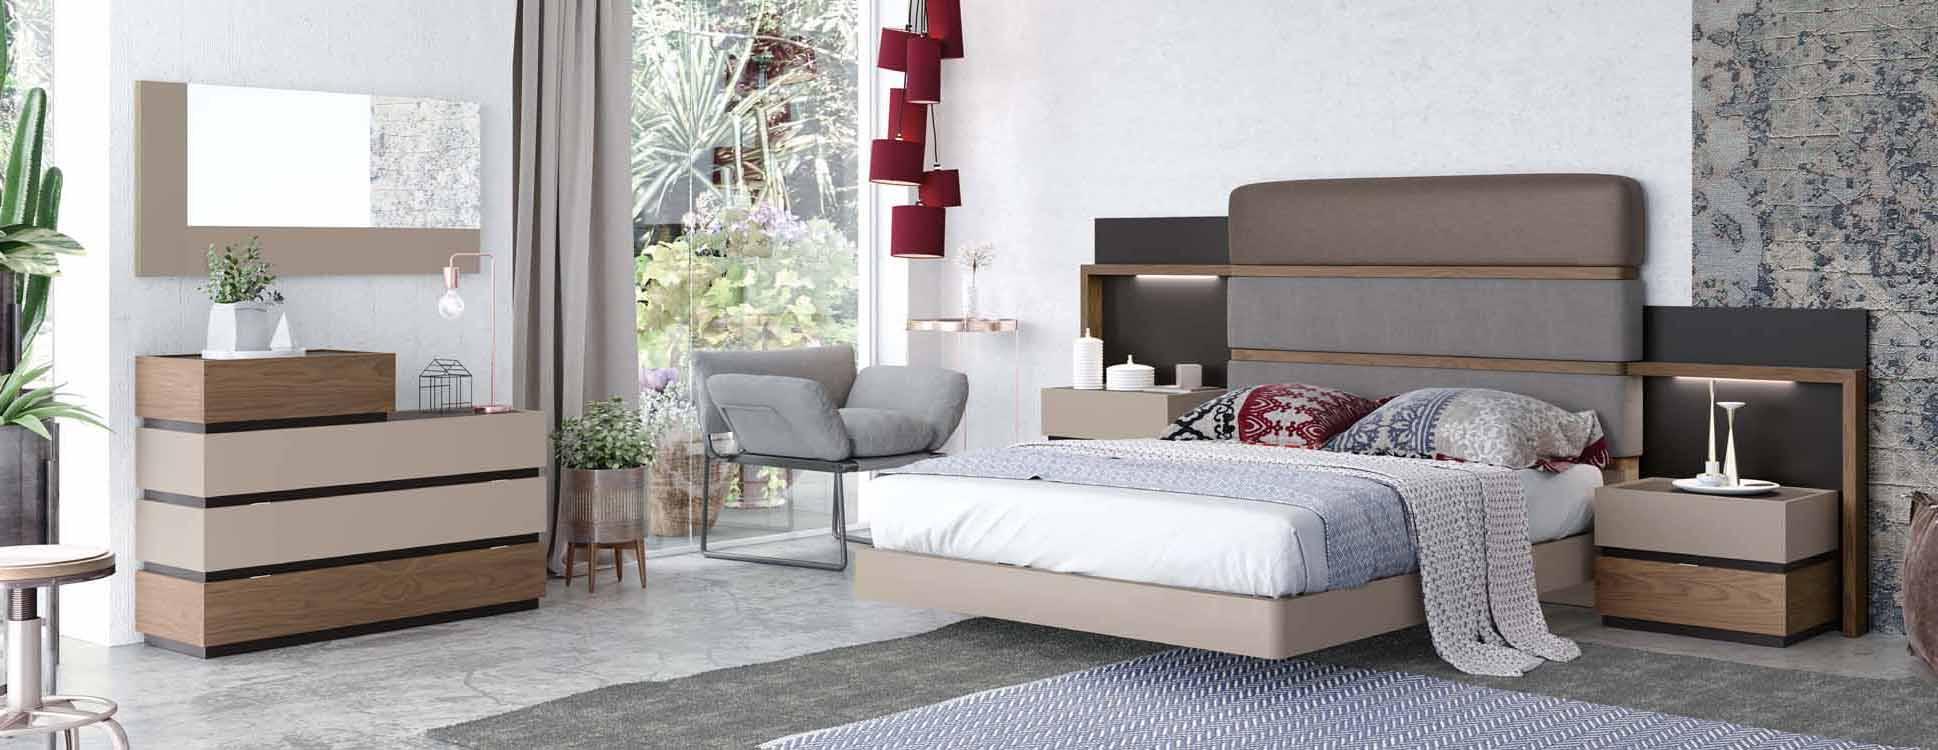 Camas de 120 cm de ancho - Sofas cama de 1 20 cm ...